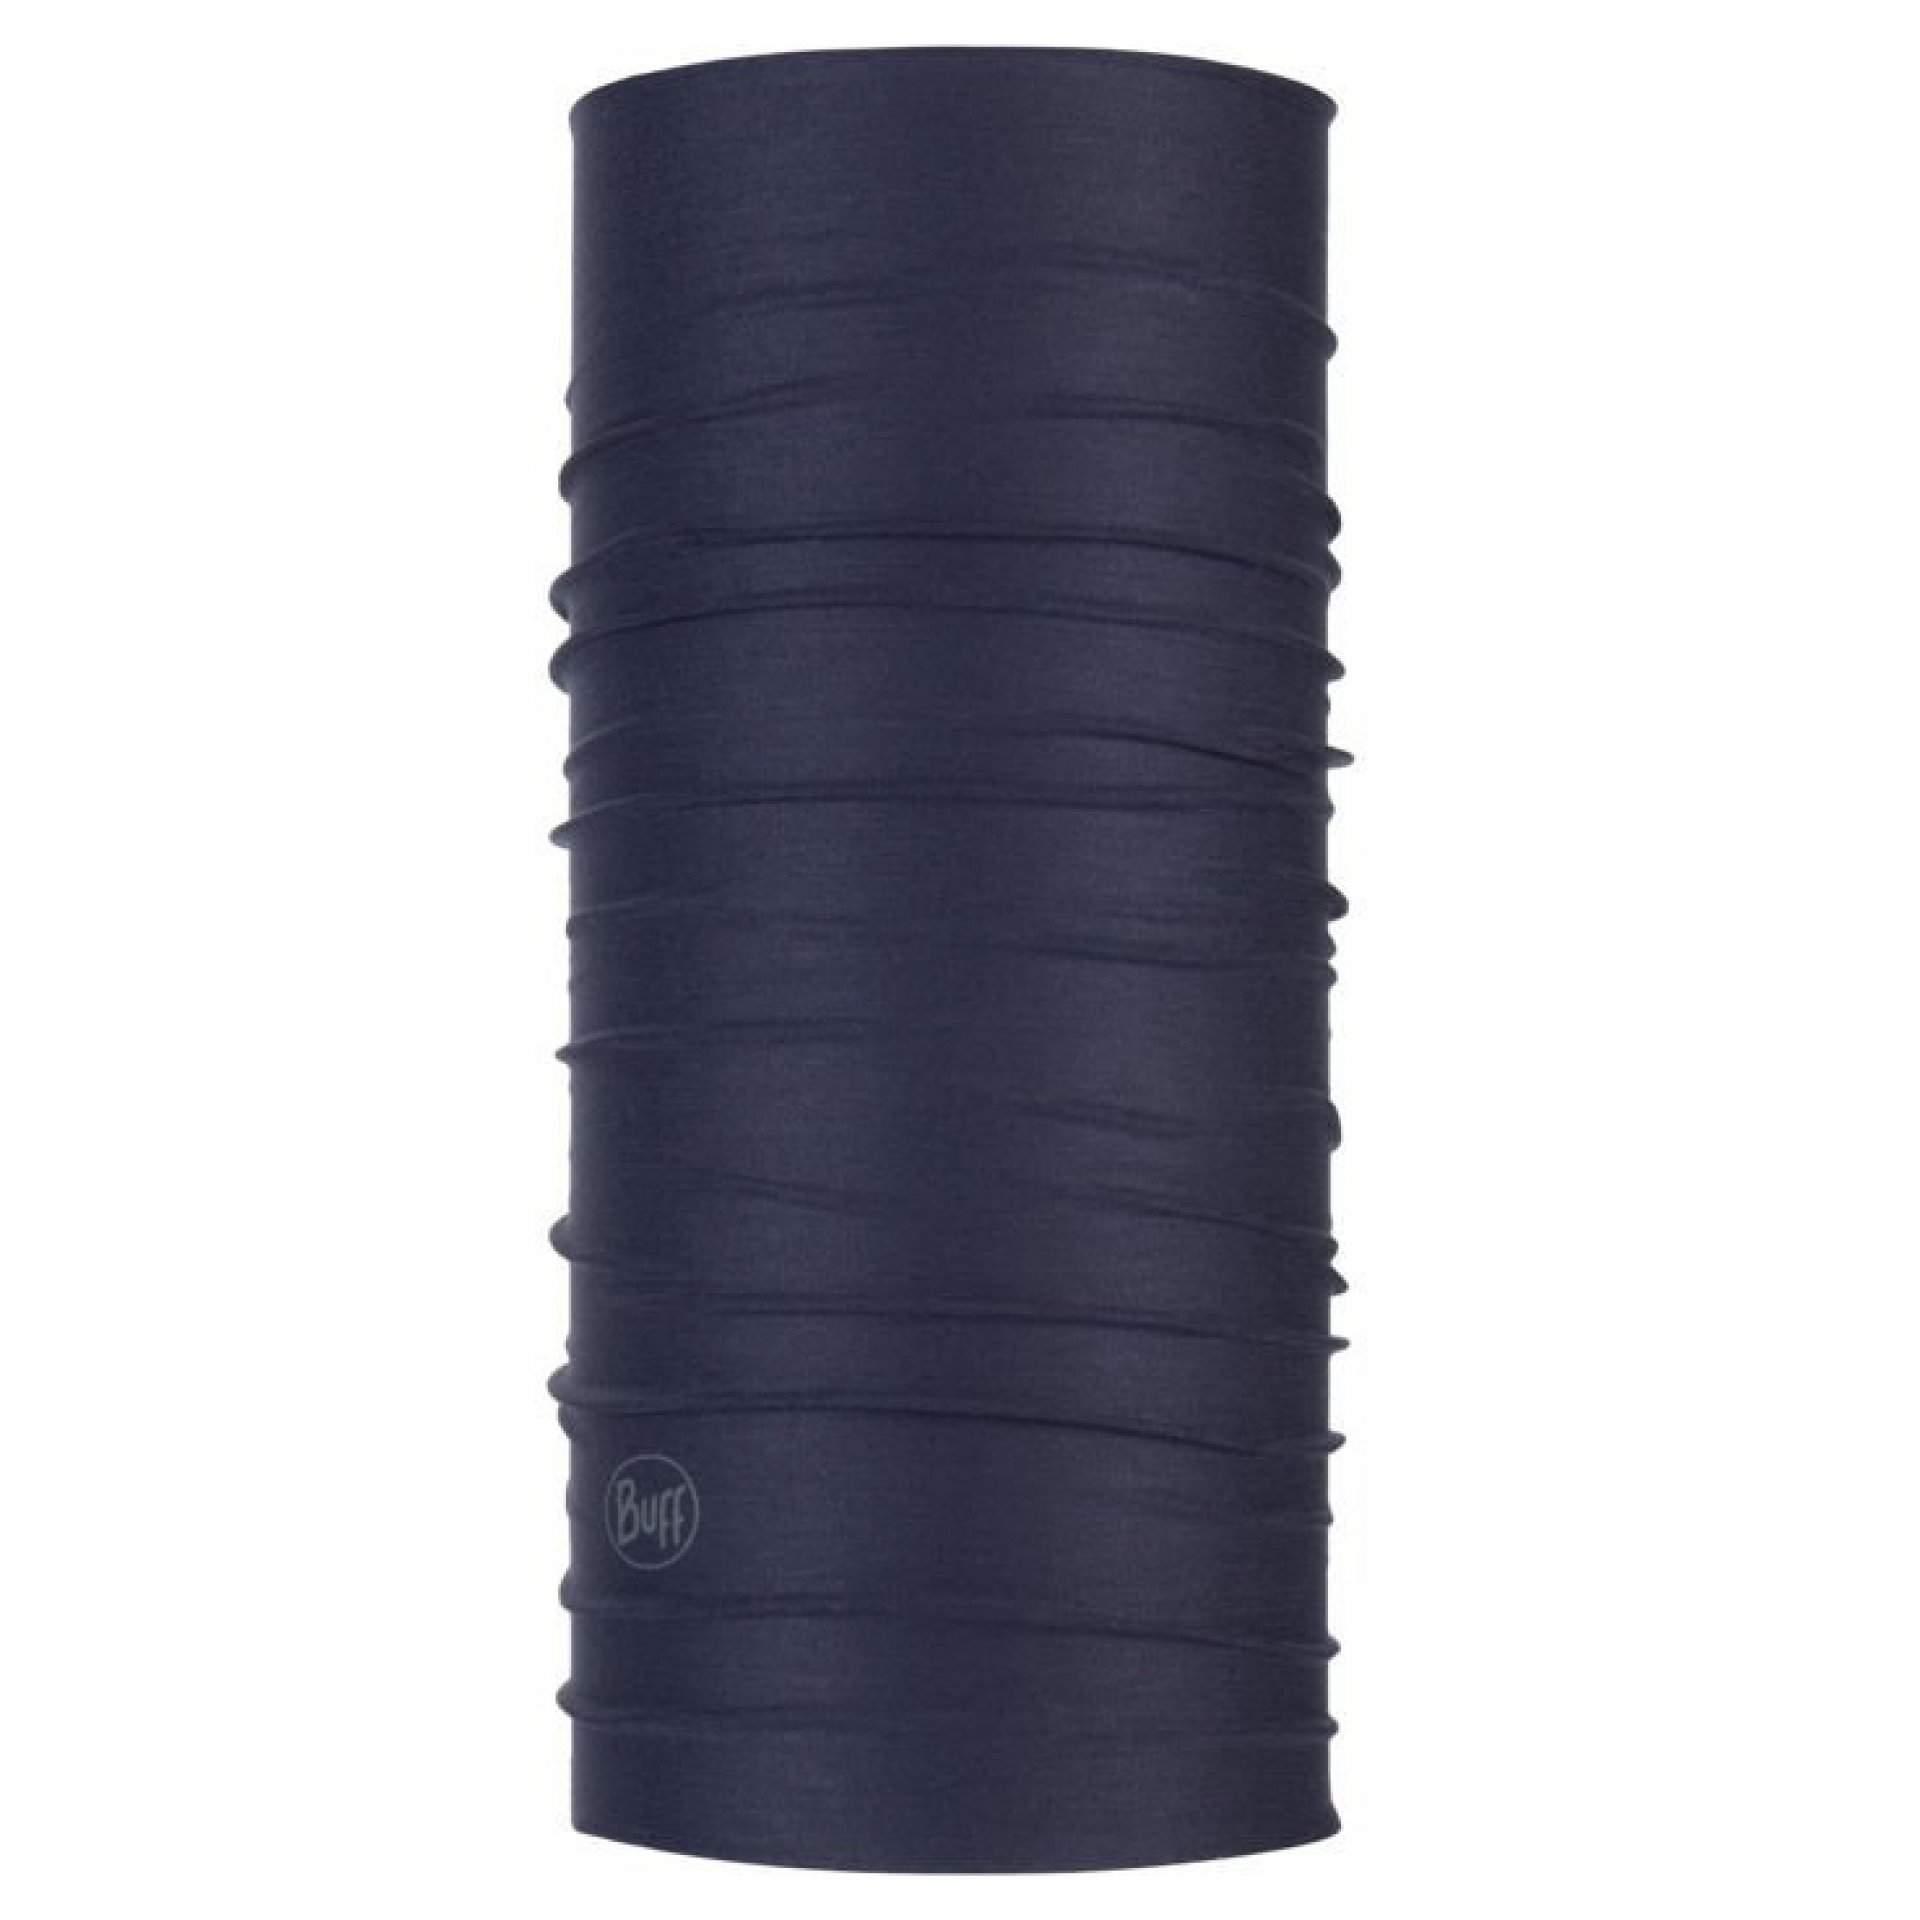 CHUSTA BUFF COOLNET UV+ SOLID NIGHT BLUE